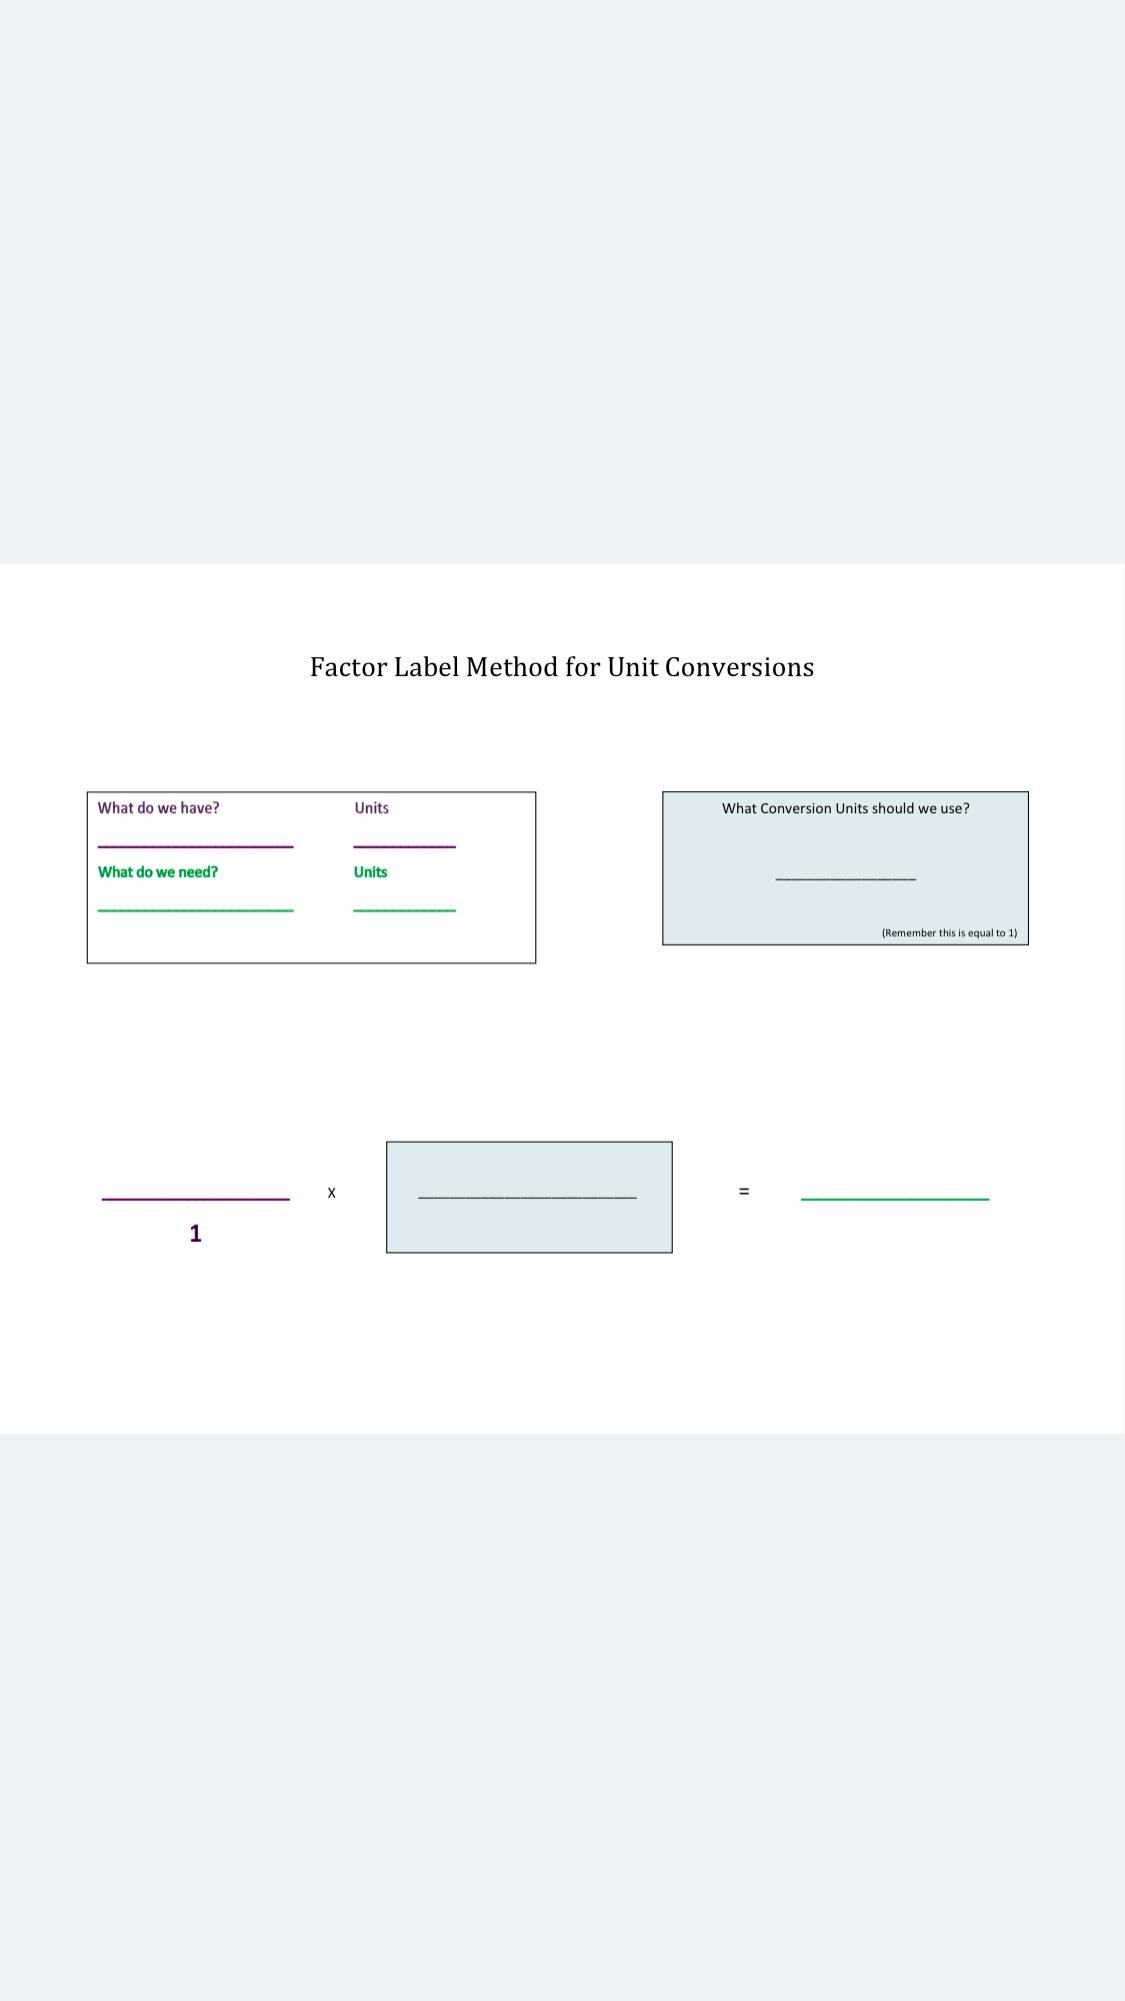 Factor Label Method For Unit Conversions